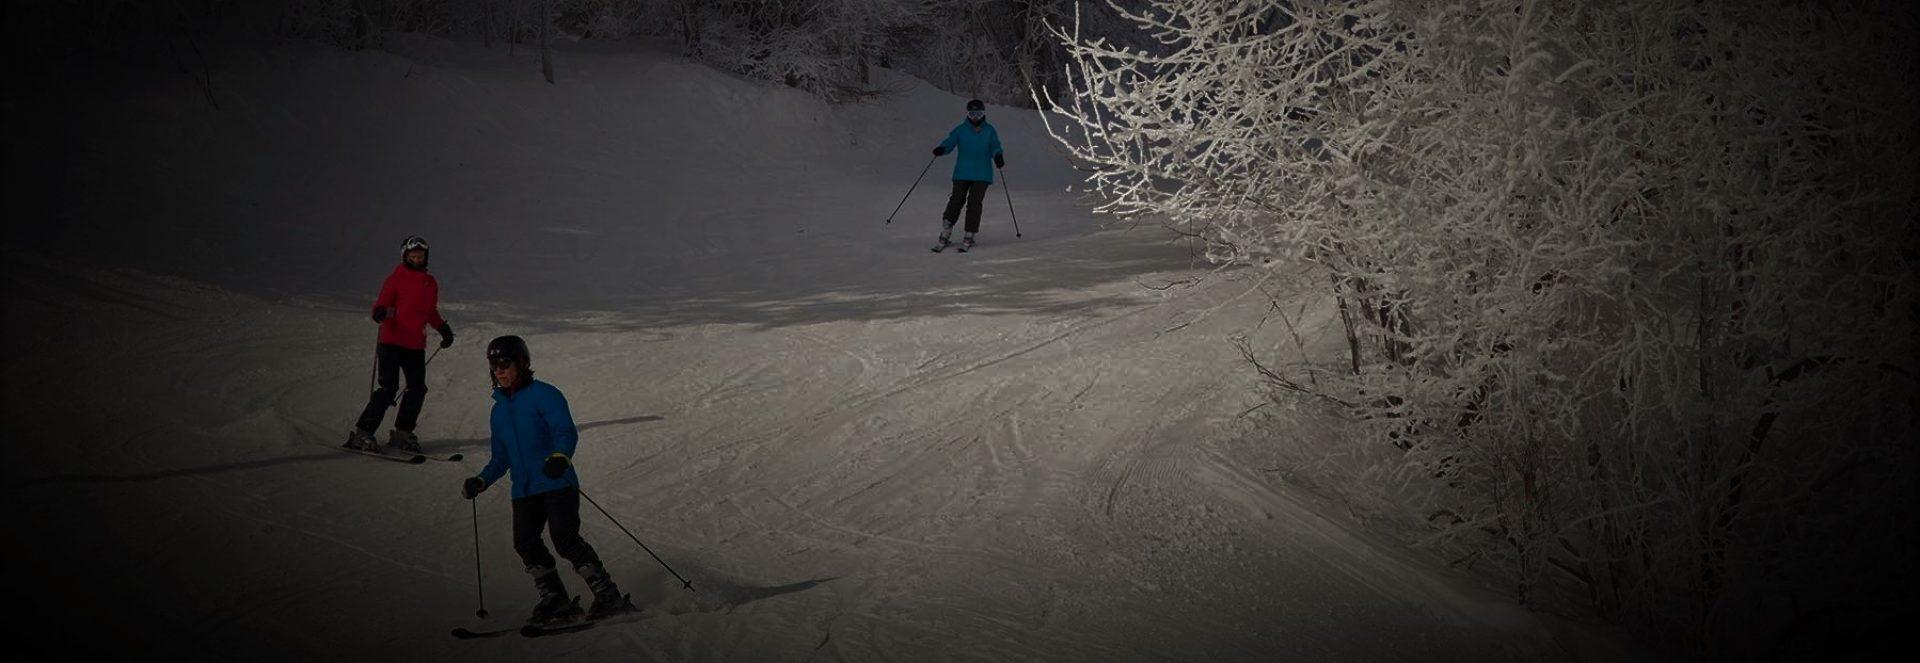 Ski N Ride Snowguide